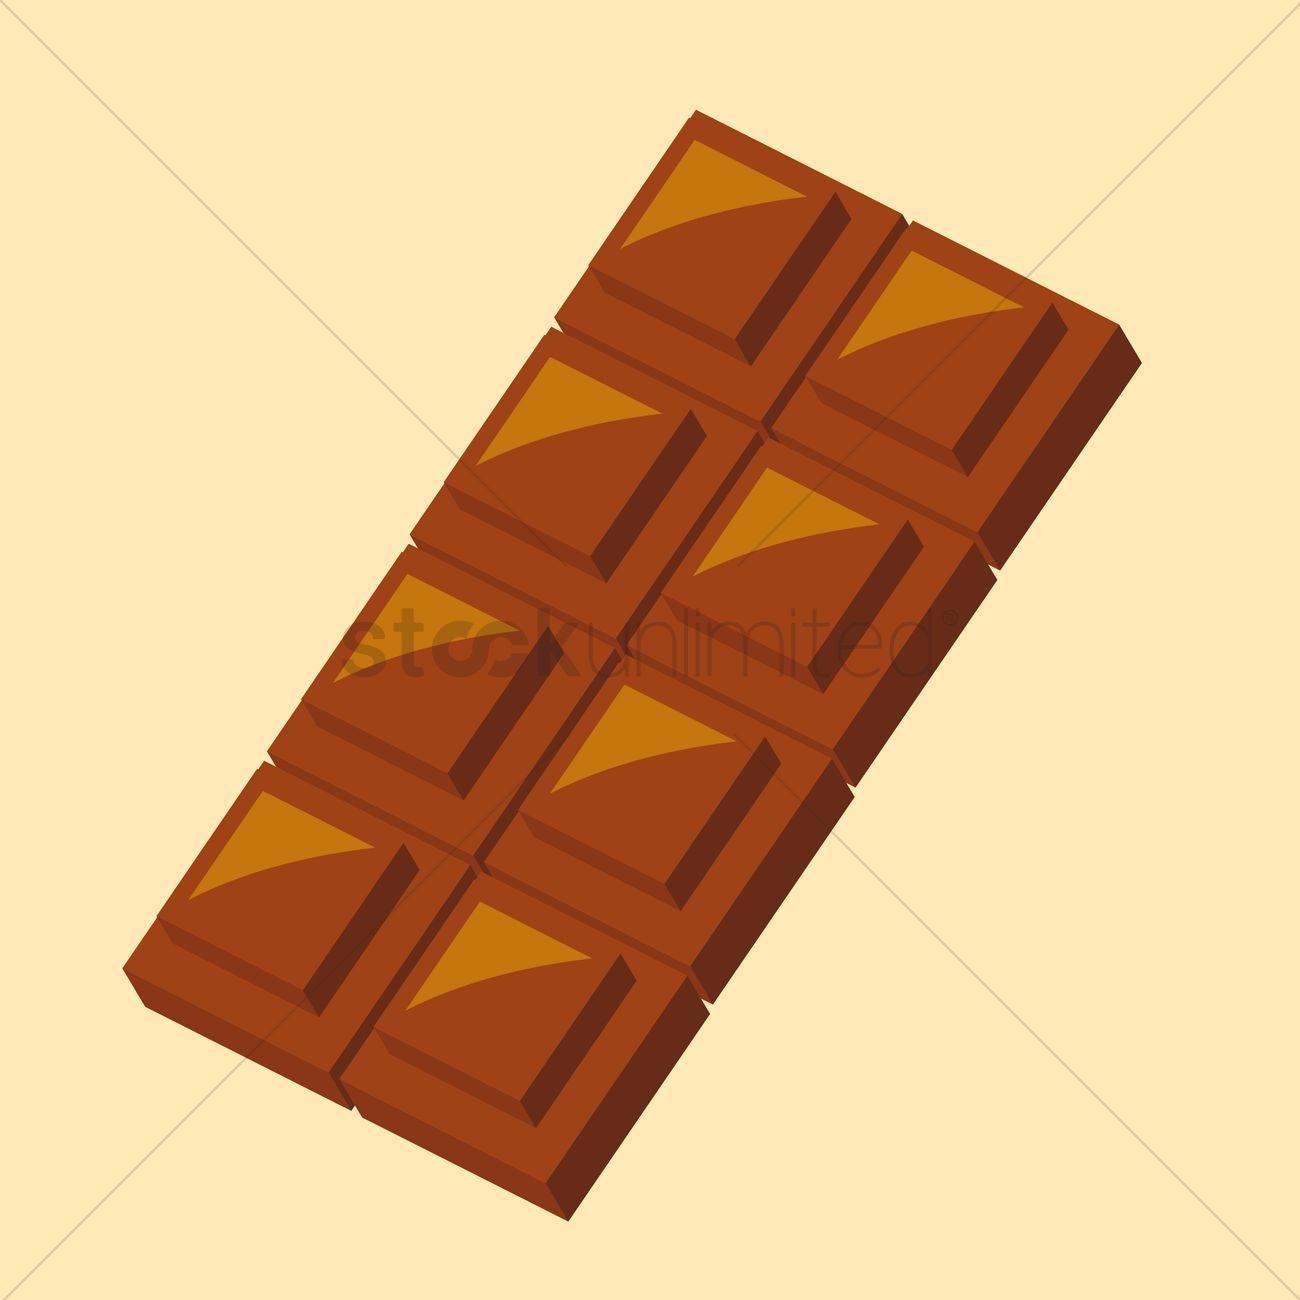 1300x1300 Chocolate Bar Vector Image